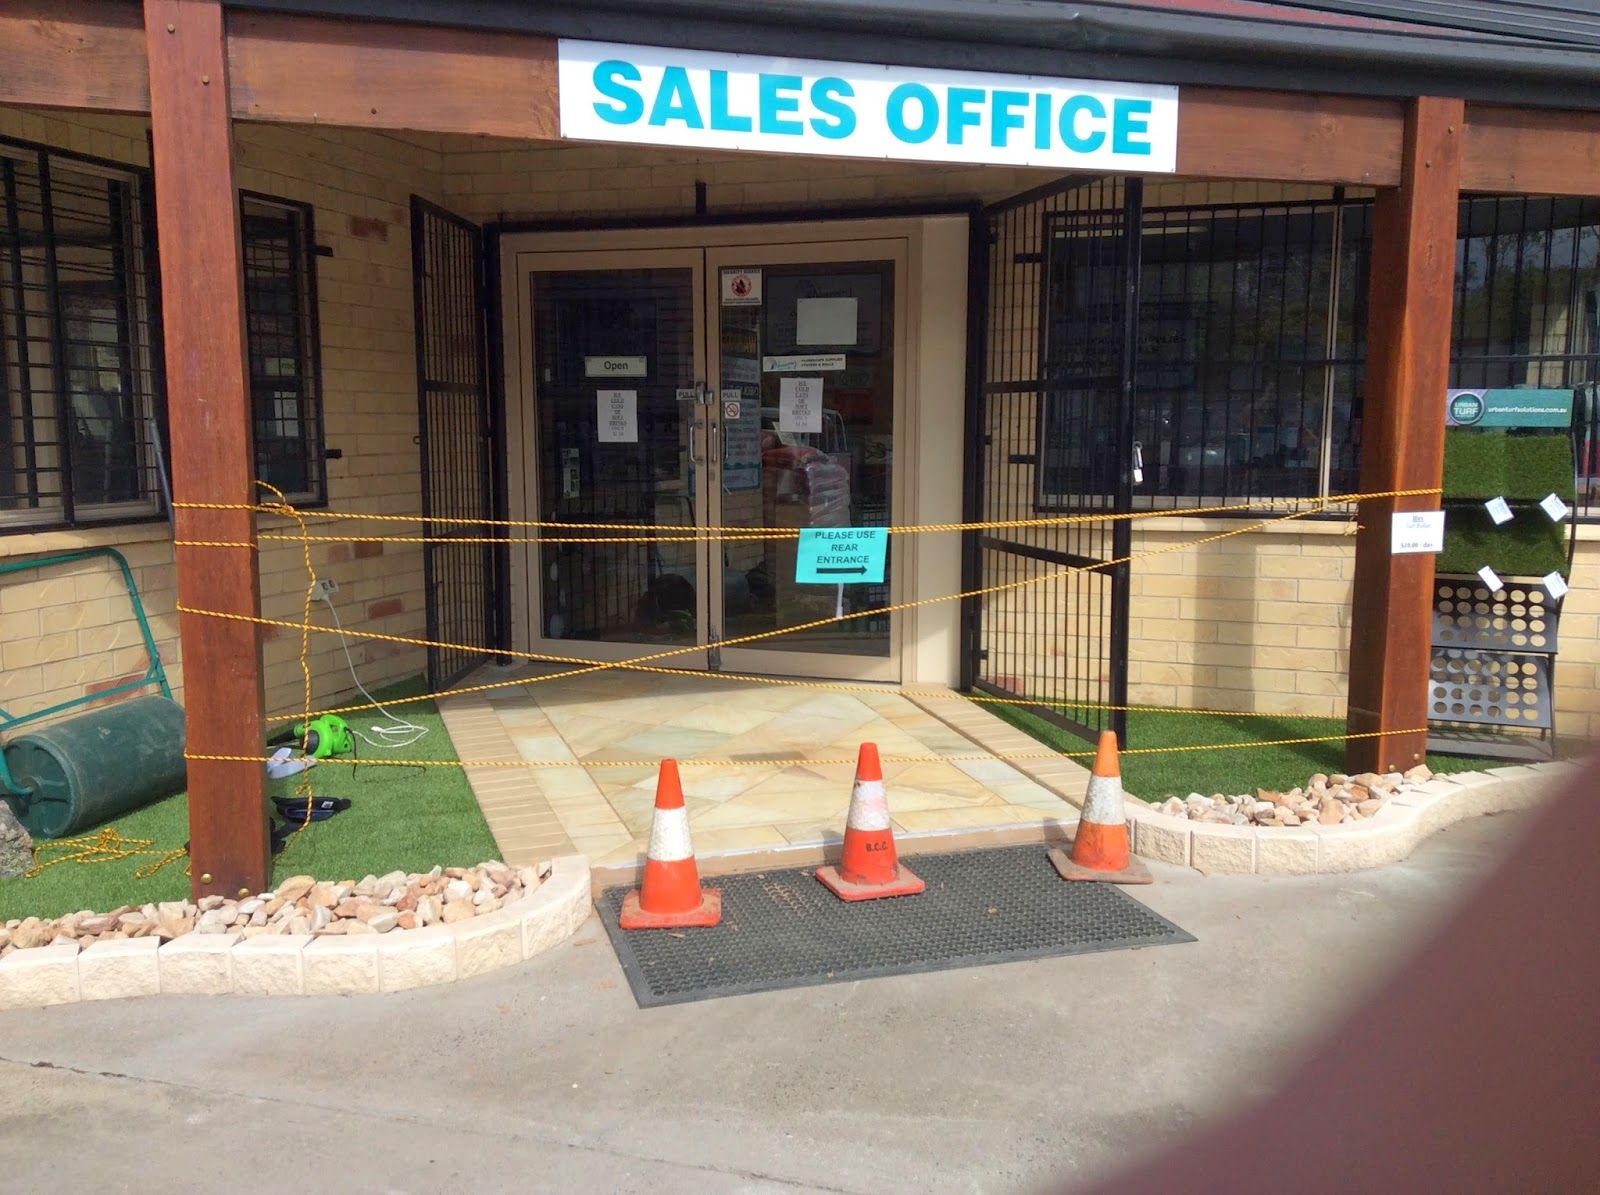 Laticrete Australia Conversations: Great Looking Shop Entrance